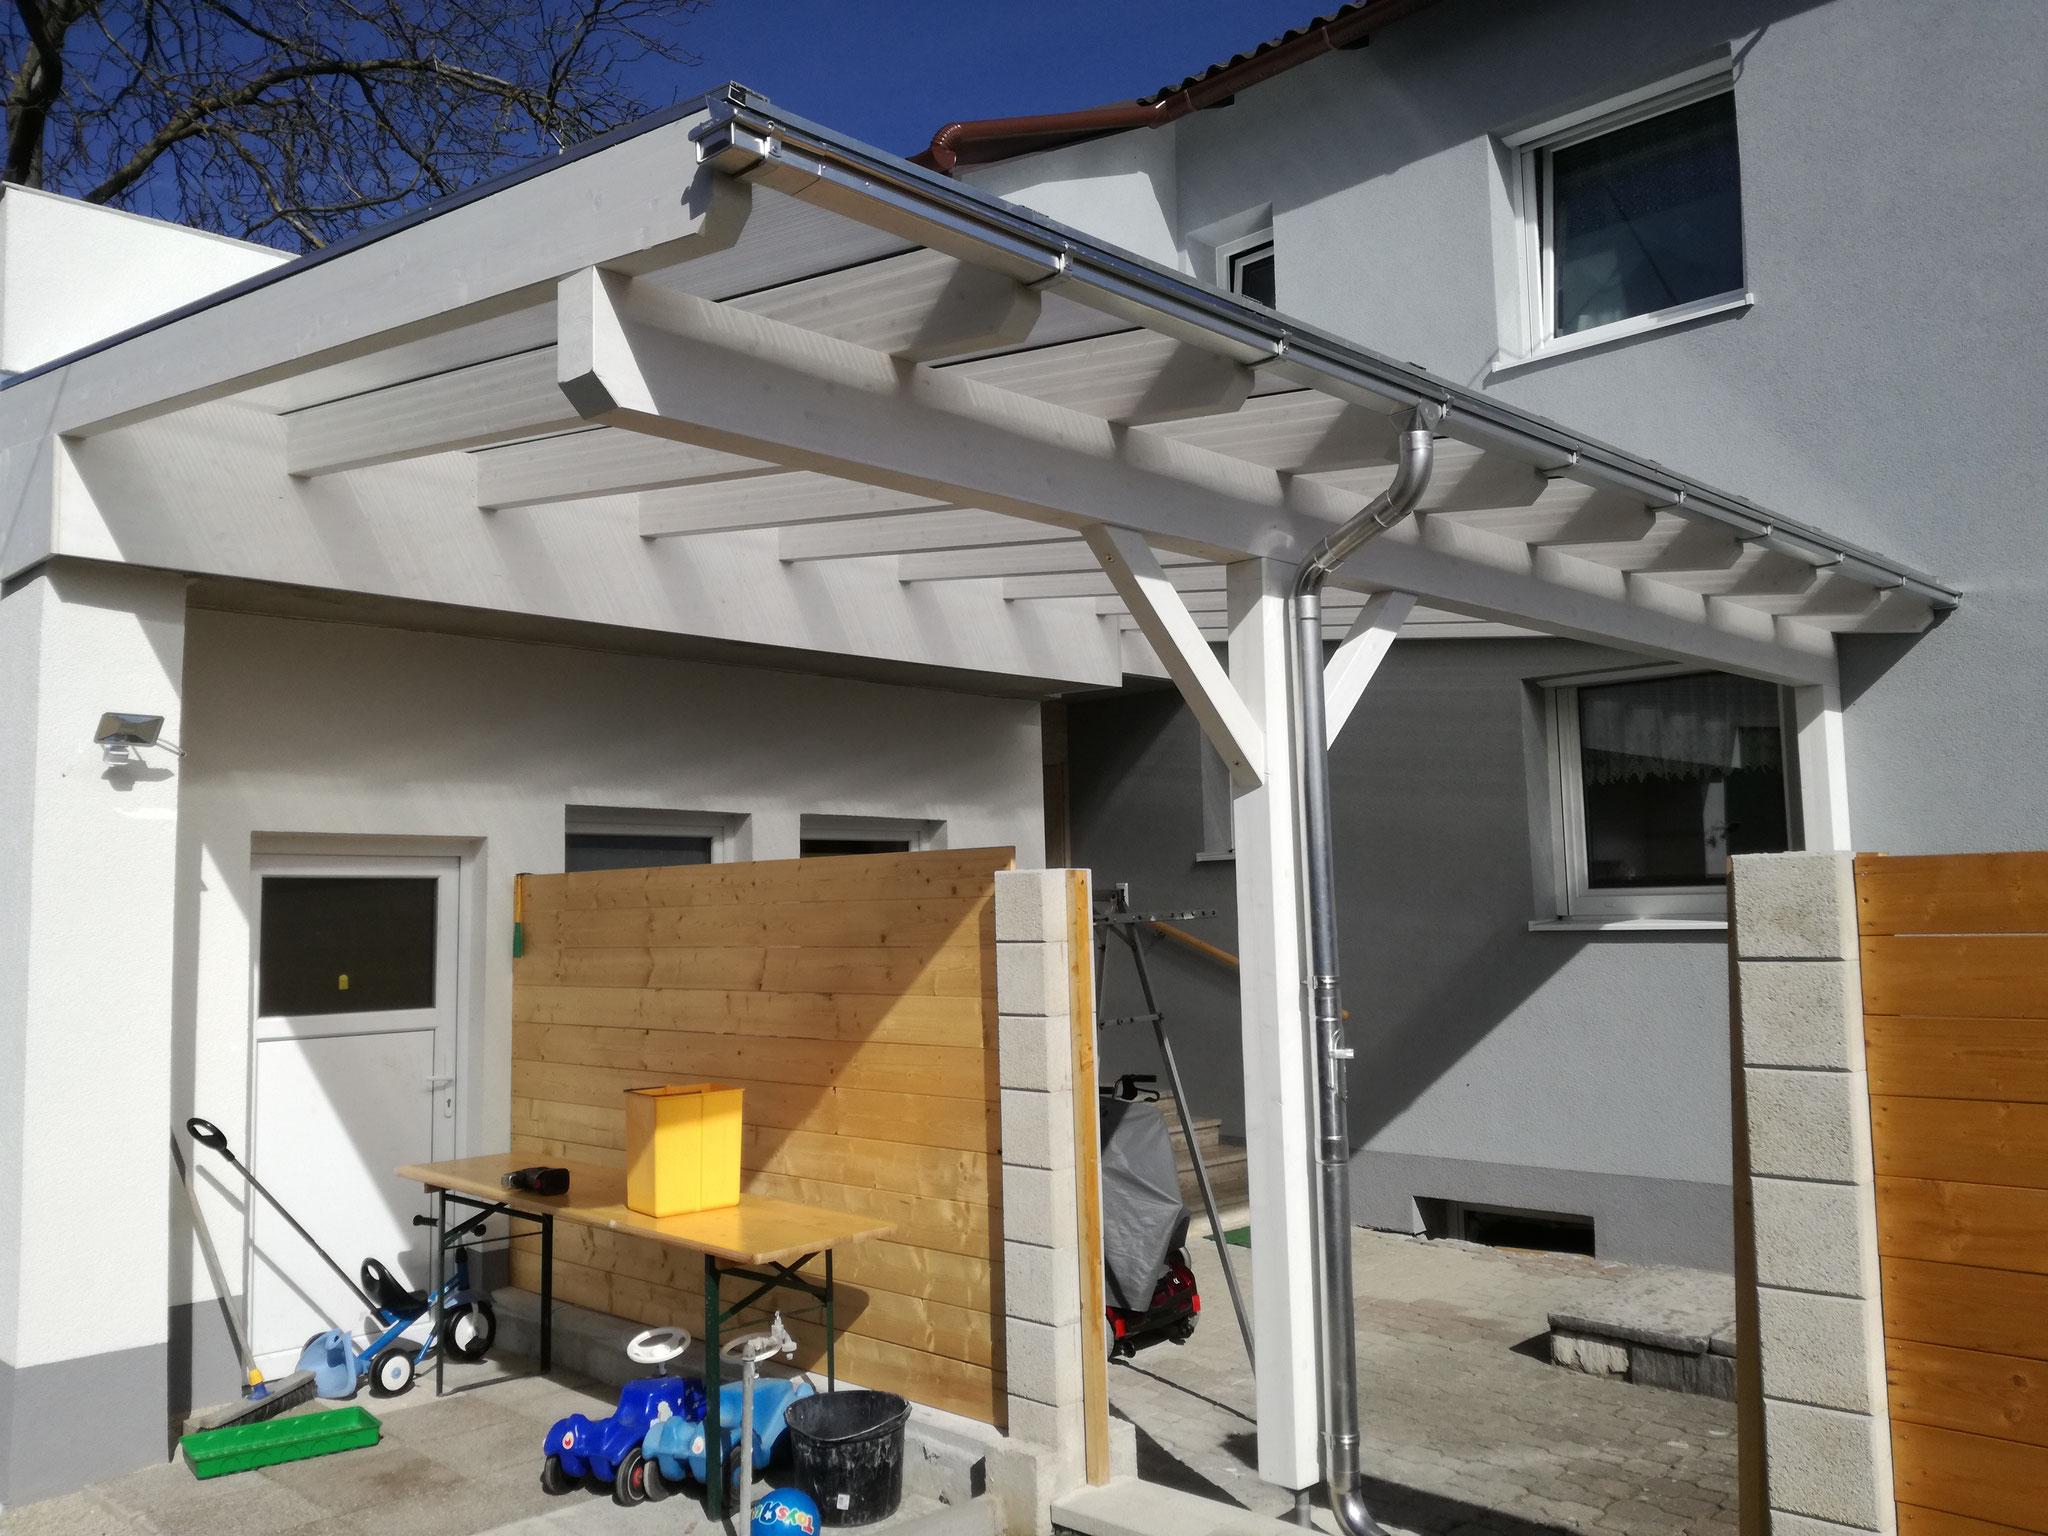 Eingangsüberdachung mit Thermoclear-Stegplatten